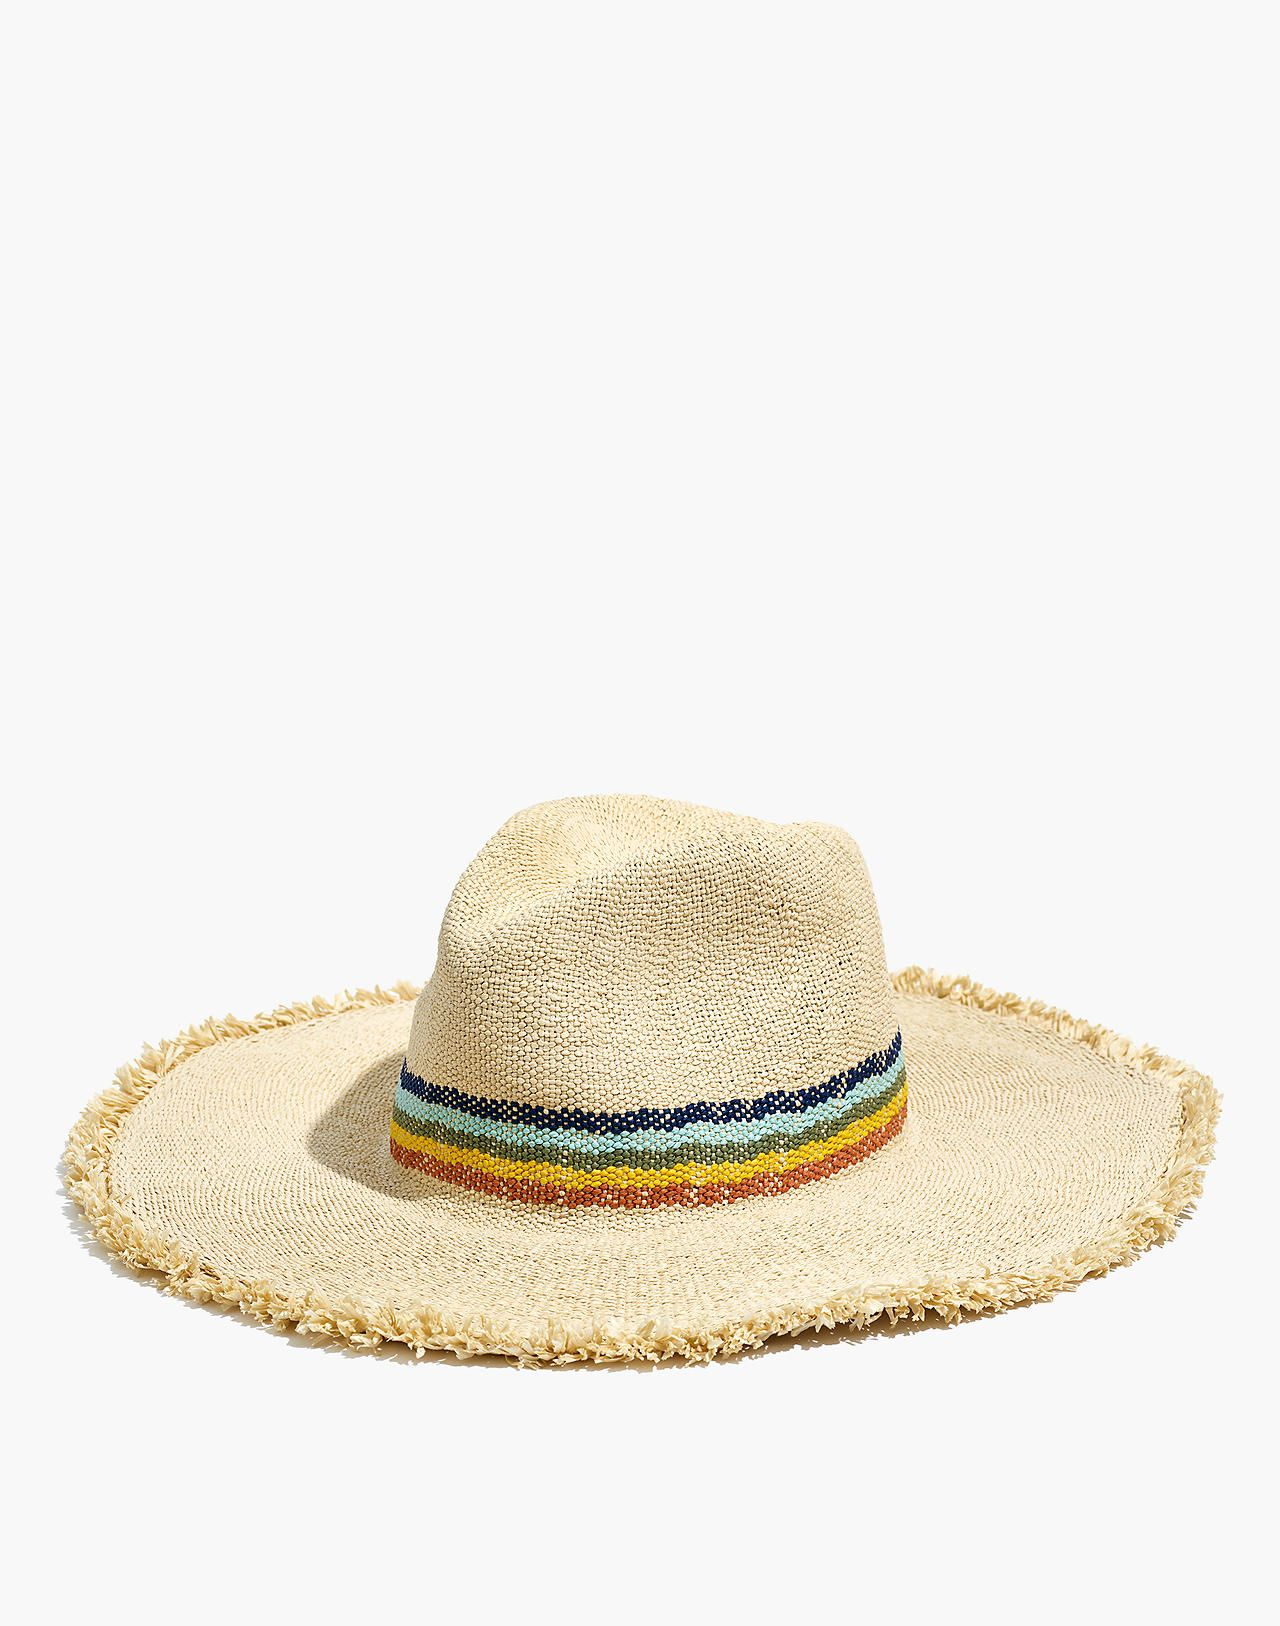 e170135db02be Madewell x Biltmore® Wide-Brimmed Rainbow Straw Hat Sun Hats